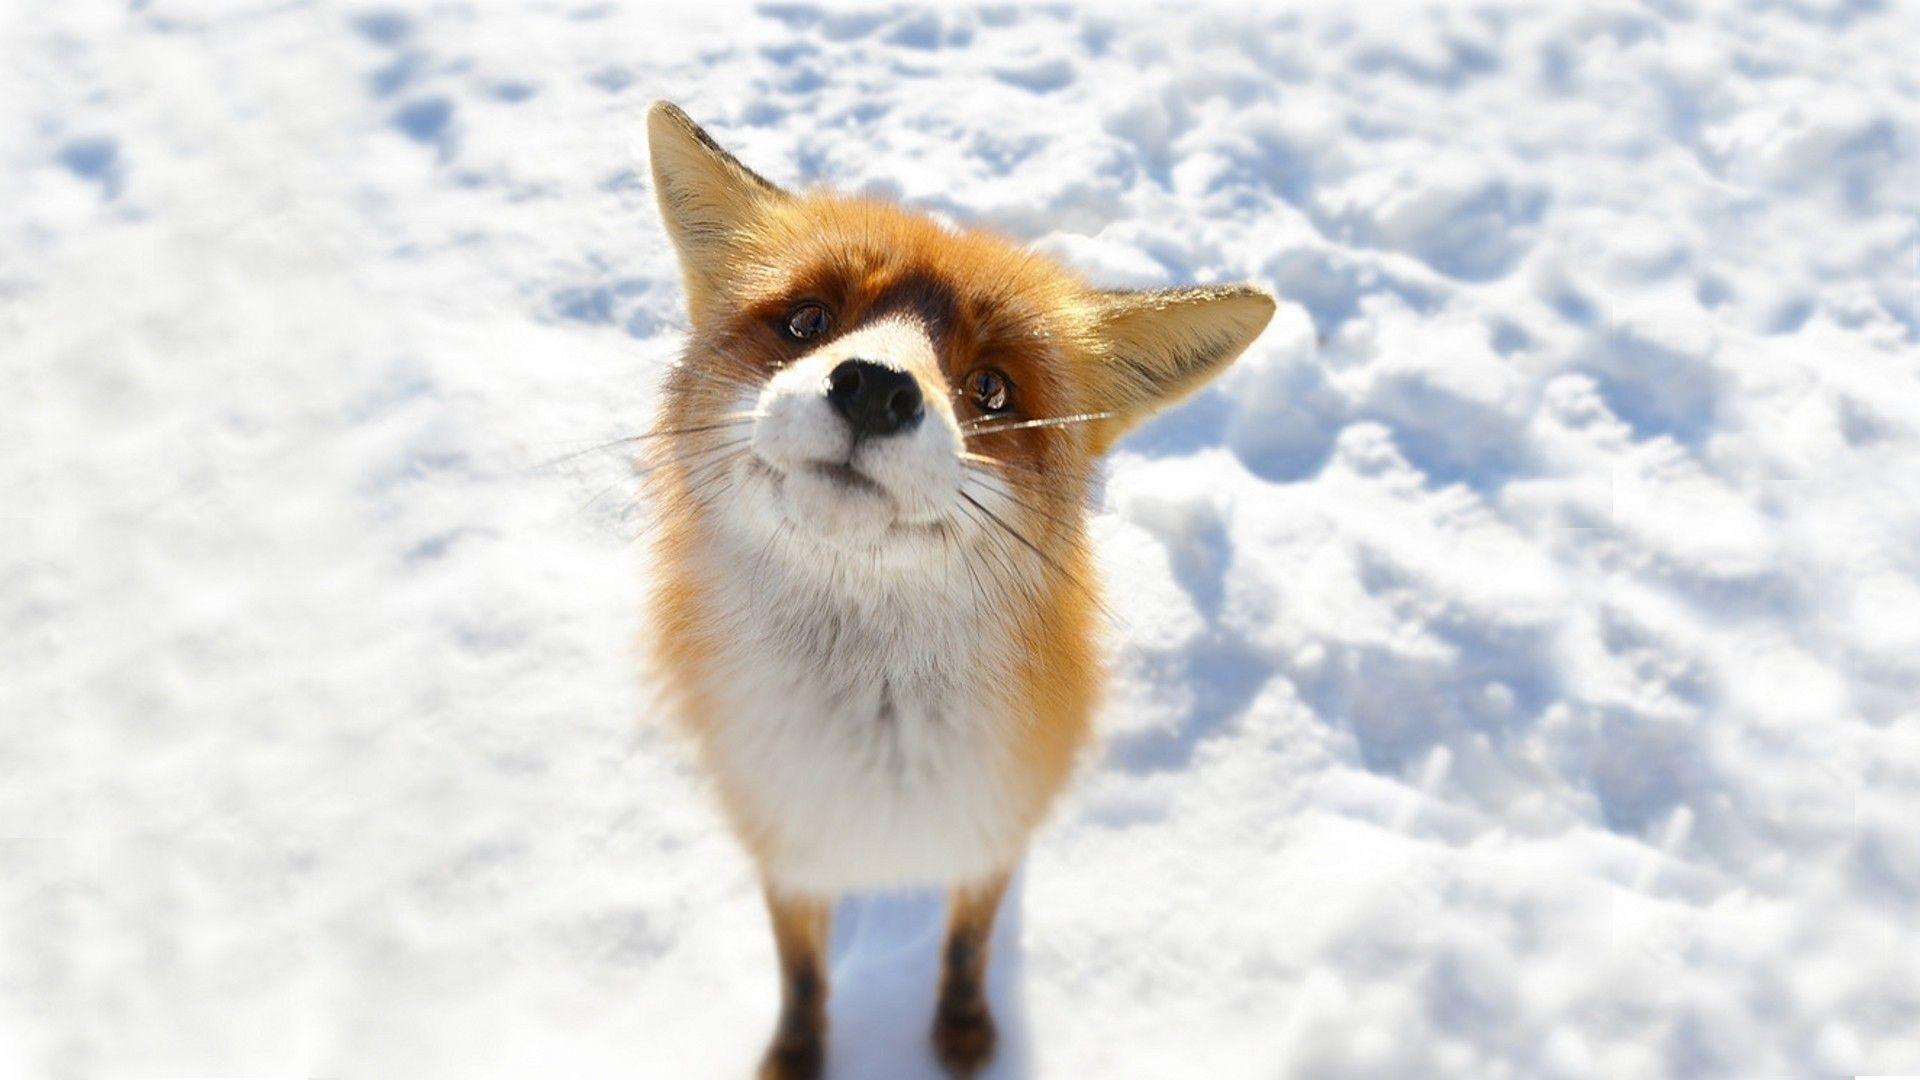 Free winter animal wallpaper – Animal Foxes Snow Winter. Download